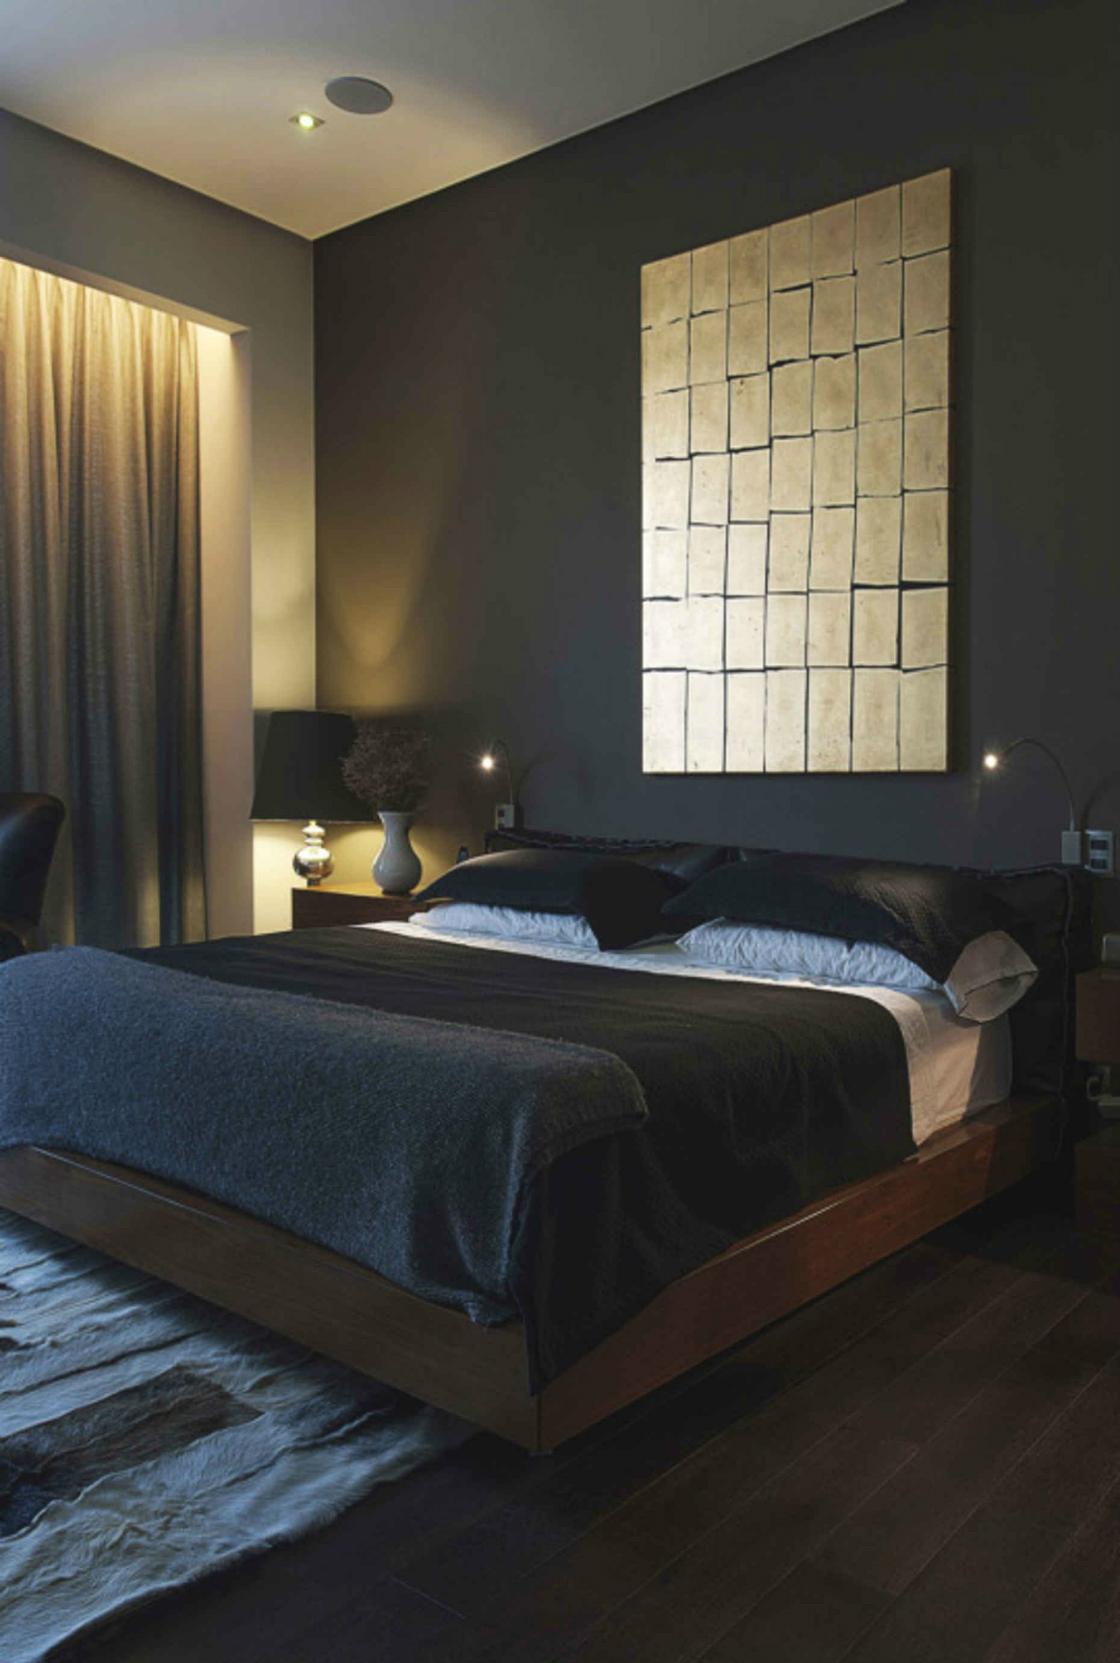 5 Bedroom Modern Farm House Floor Plans: 8 Stylish Hotel Bedroom Ideas To Keep An Eye